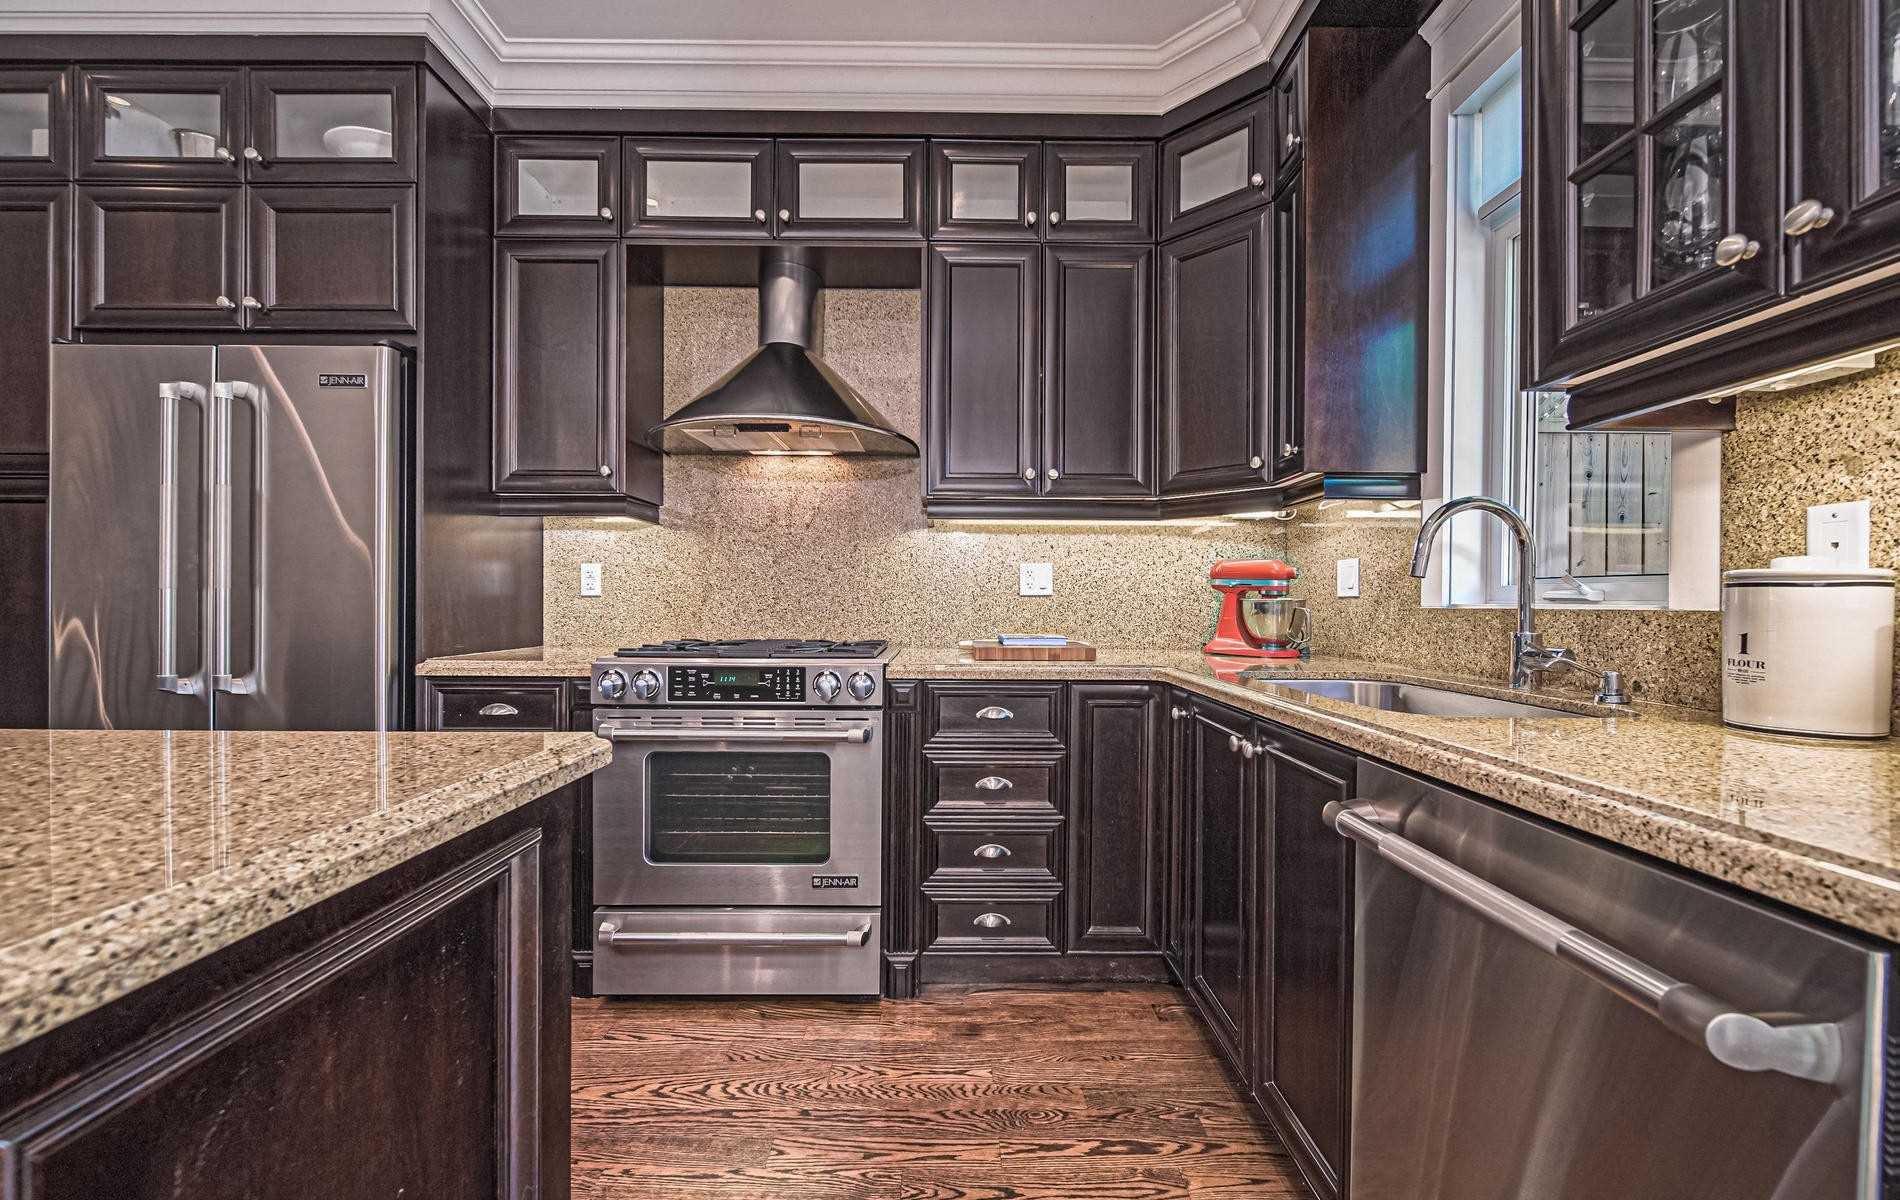 Photo 7: Photos: 216A Hamilton Street in Toronto: South Riverdale House (3-Storey) for sale (Toronto E01)  : MLS®# E4619870